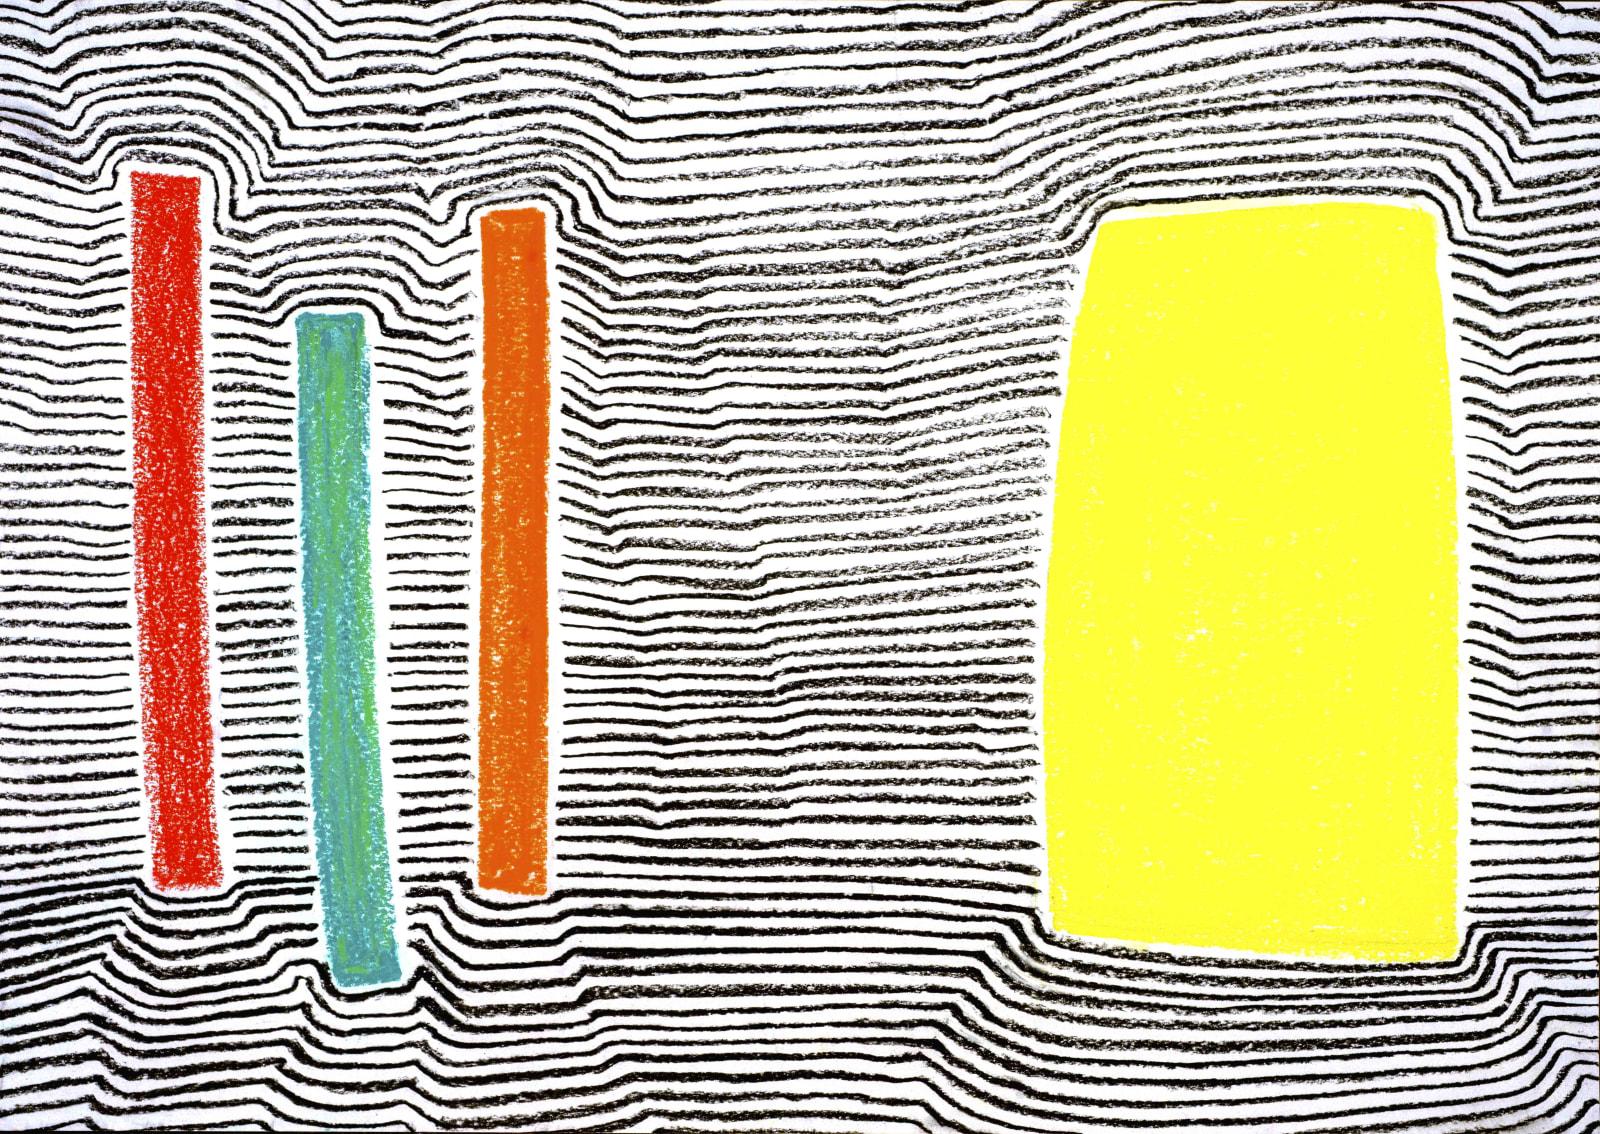 Osvaldo Mariscotti, Untitled NI-II, 2019